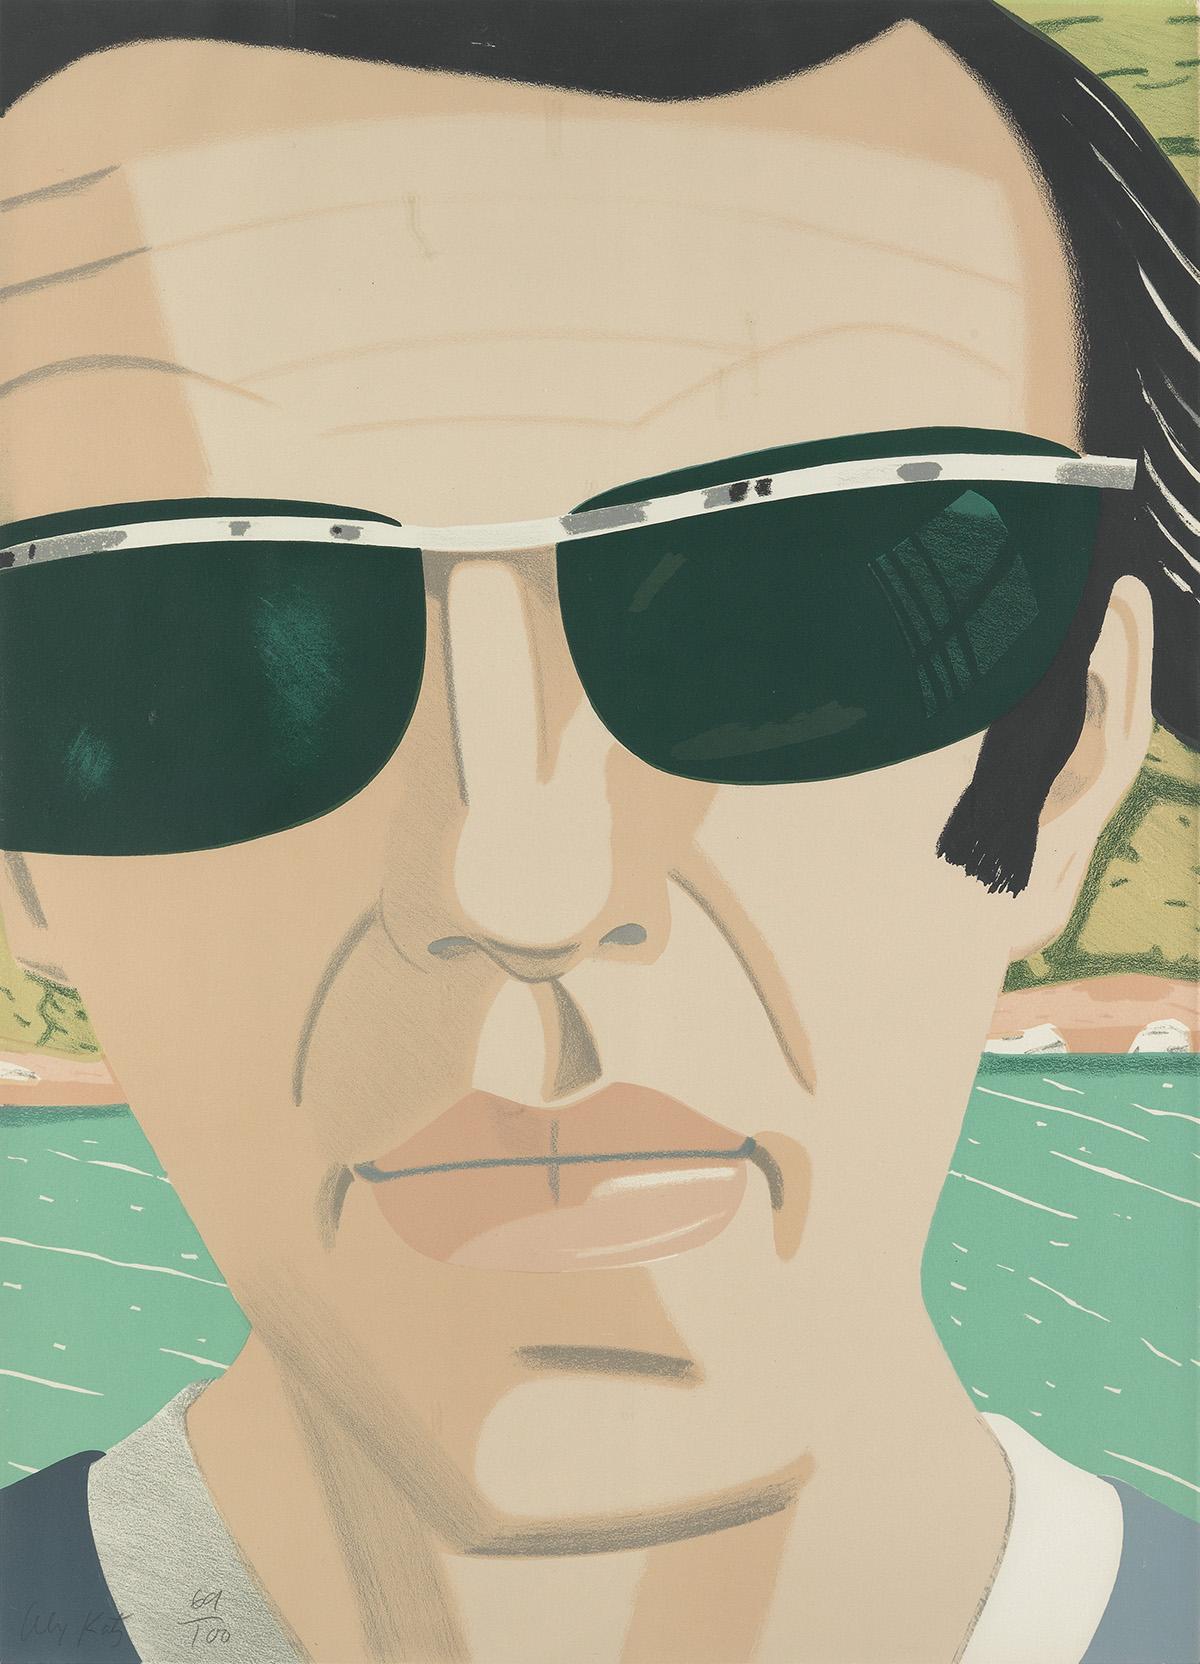 ALEX-KATZ-Self-Portrait-with-Sunglasses